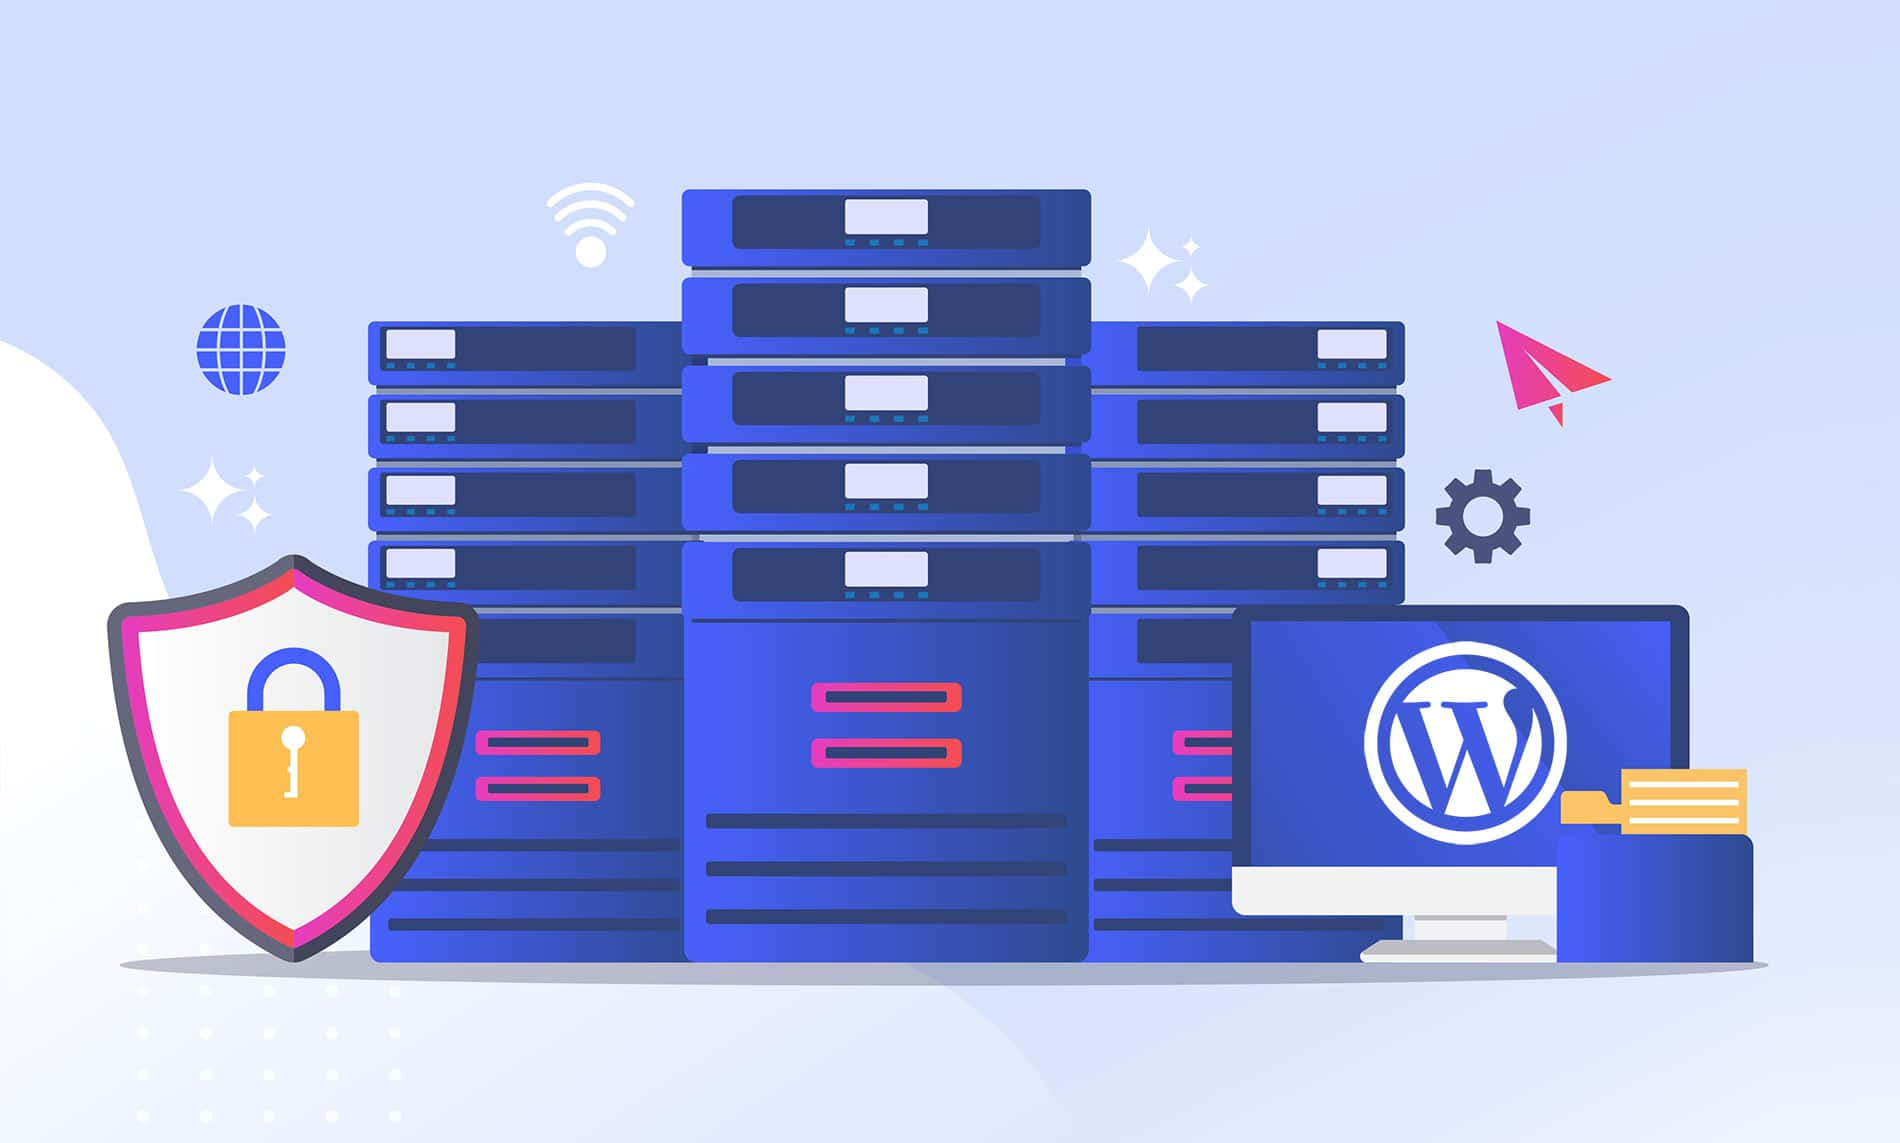 Wordpress managed hosting services